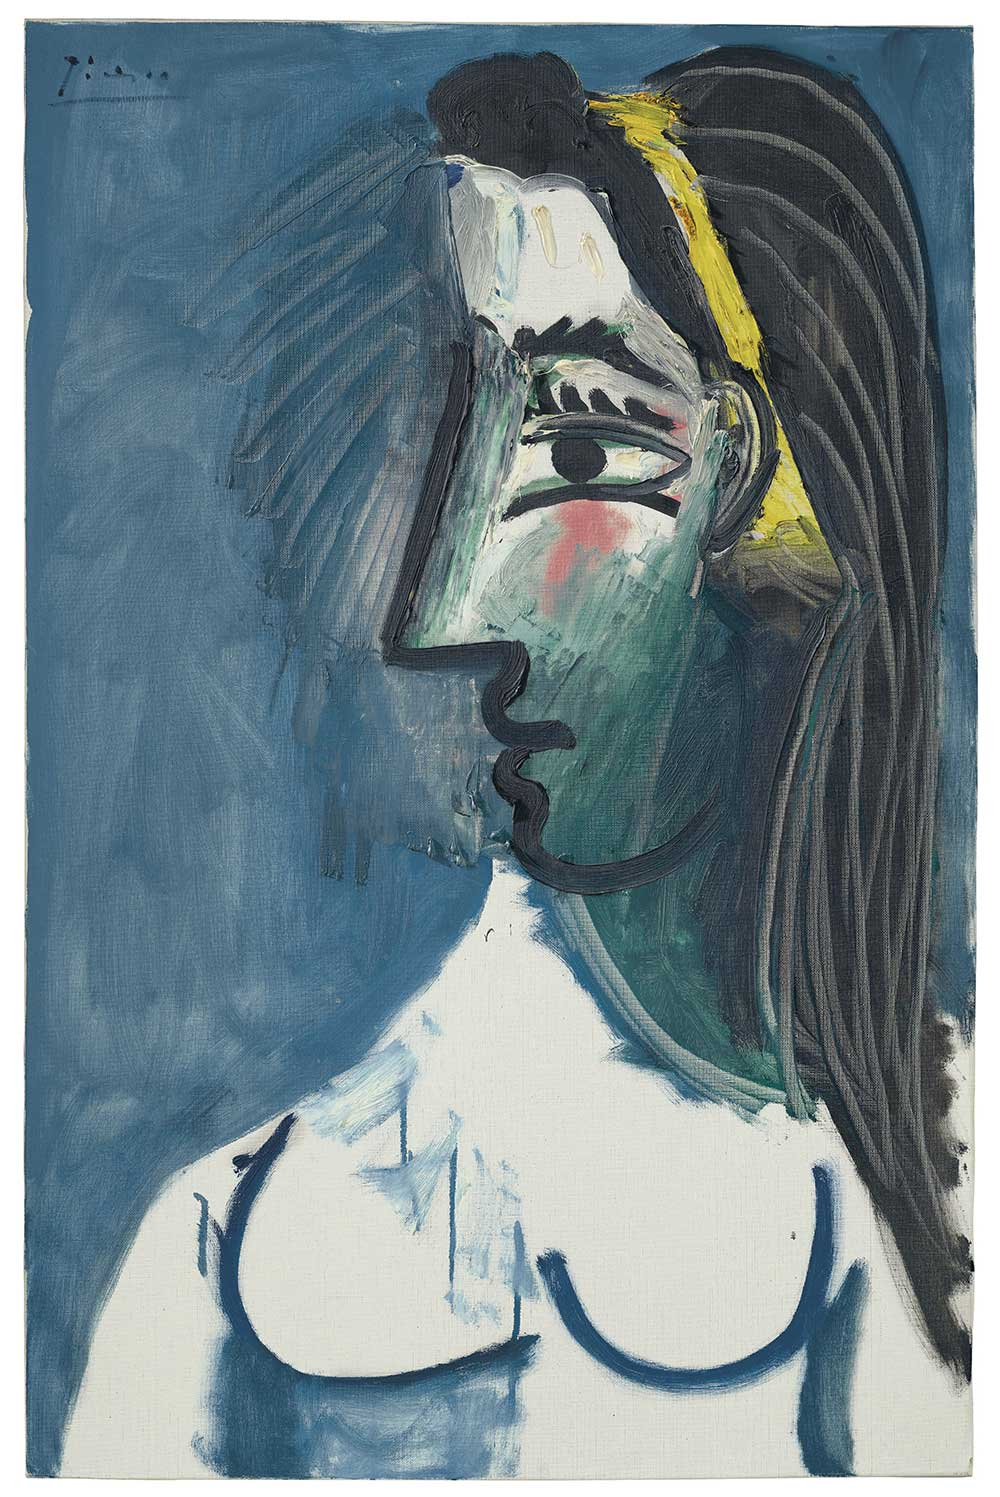 Pablo Picasso,,《Buste de femme nue (tête de profil)》,15 May 1963。預估價500-800萬美元。圖/佳士得提供。